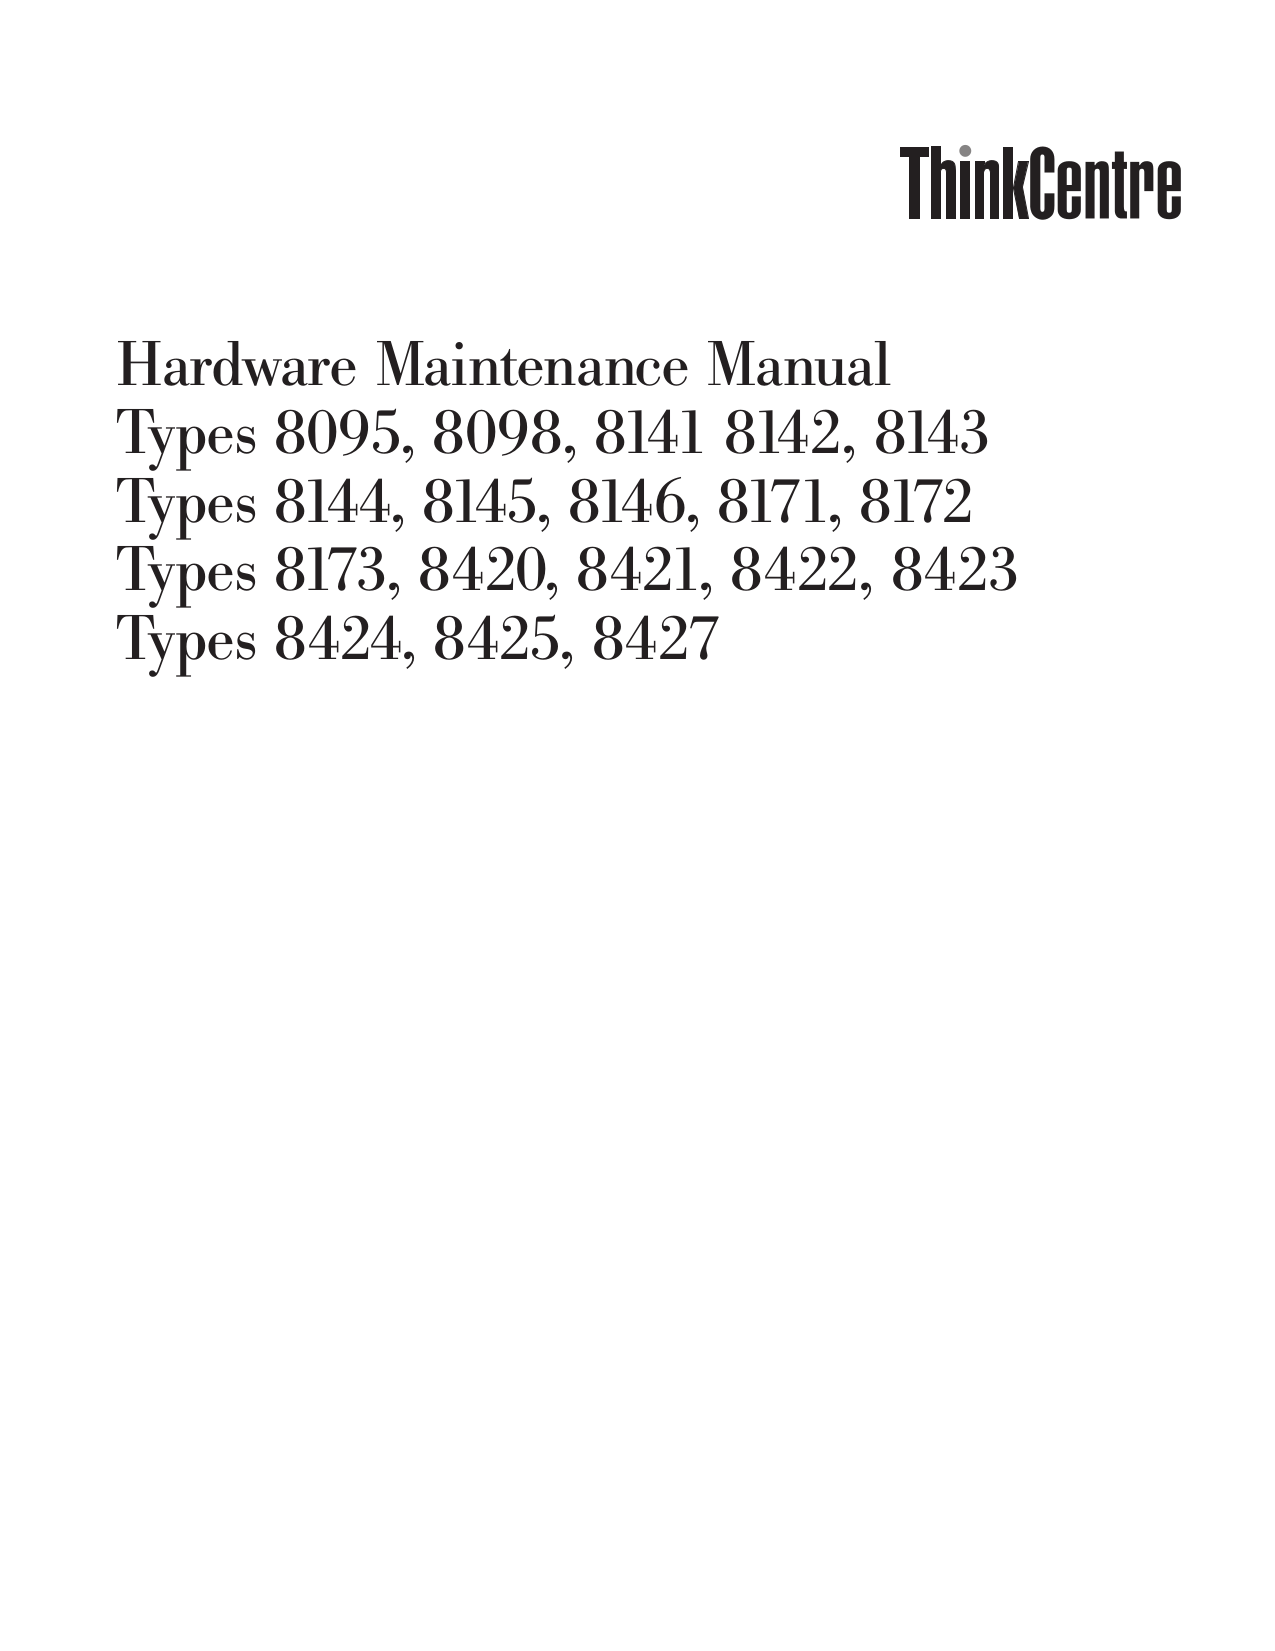 pdf for Lenovo Desktop ThinkCentre M51 8142 manual